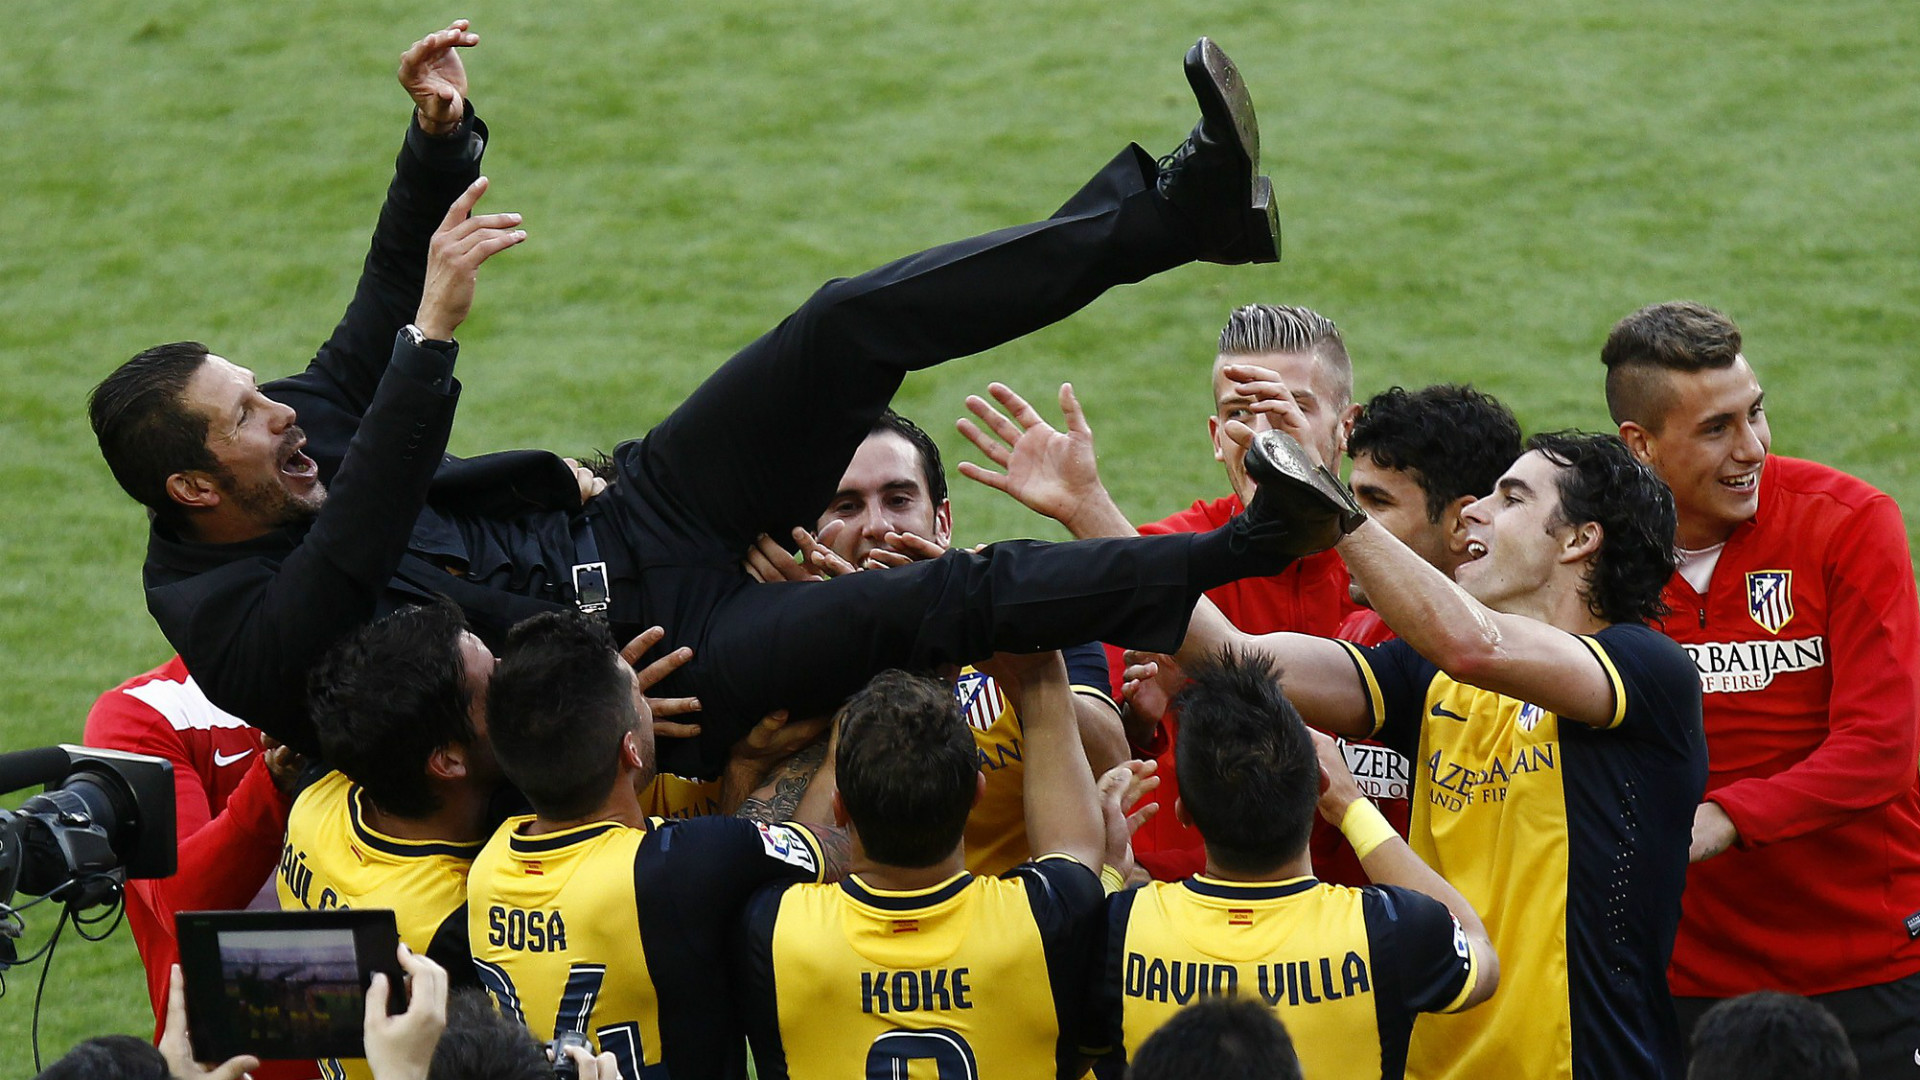 Atletico Camp Nou Barcelona 2014